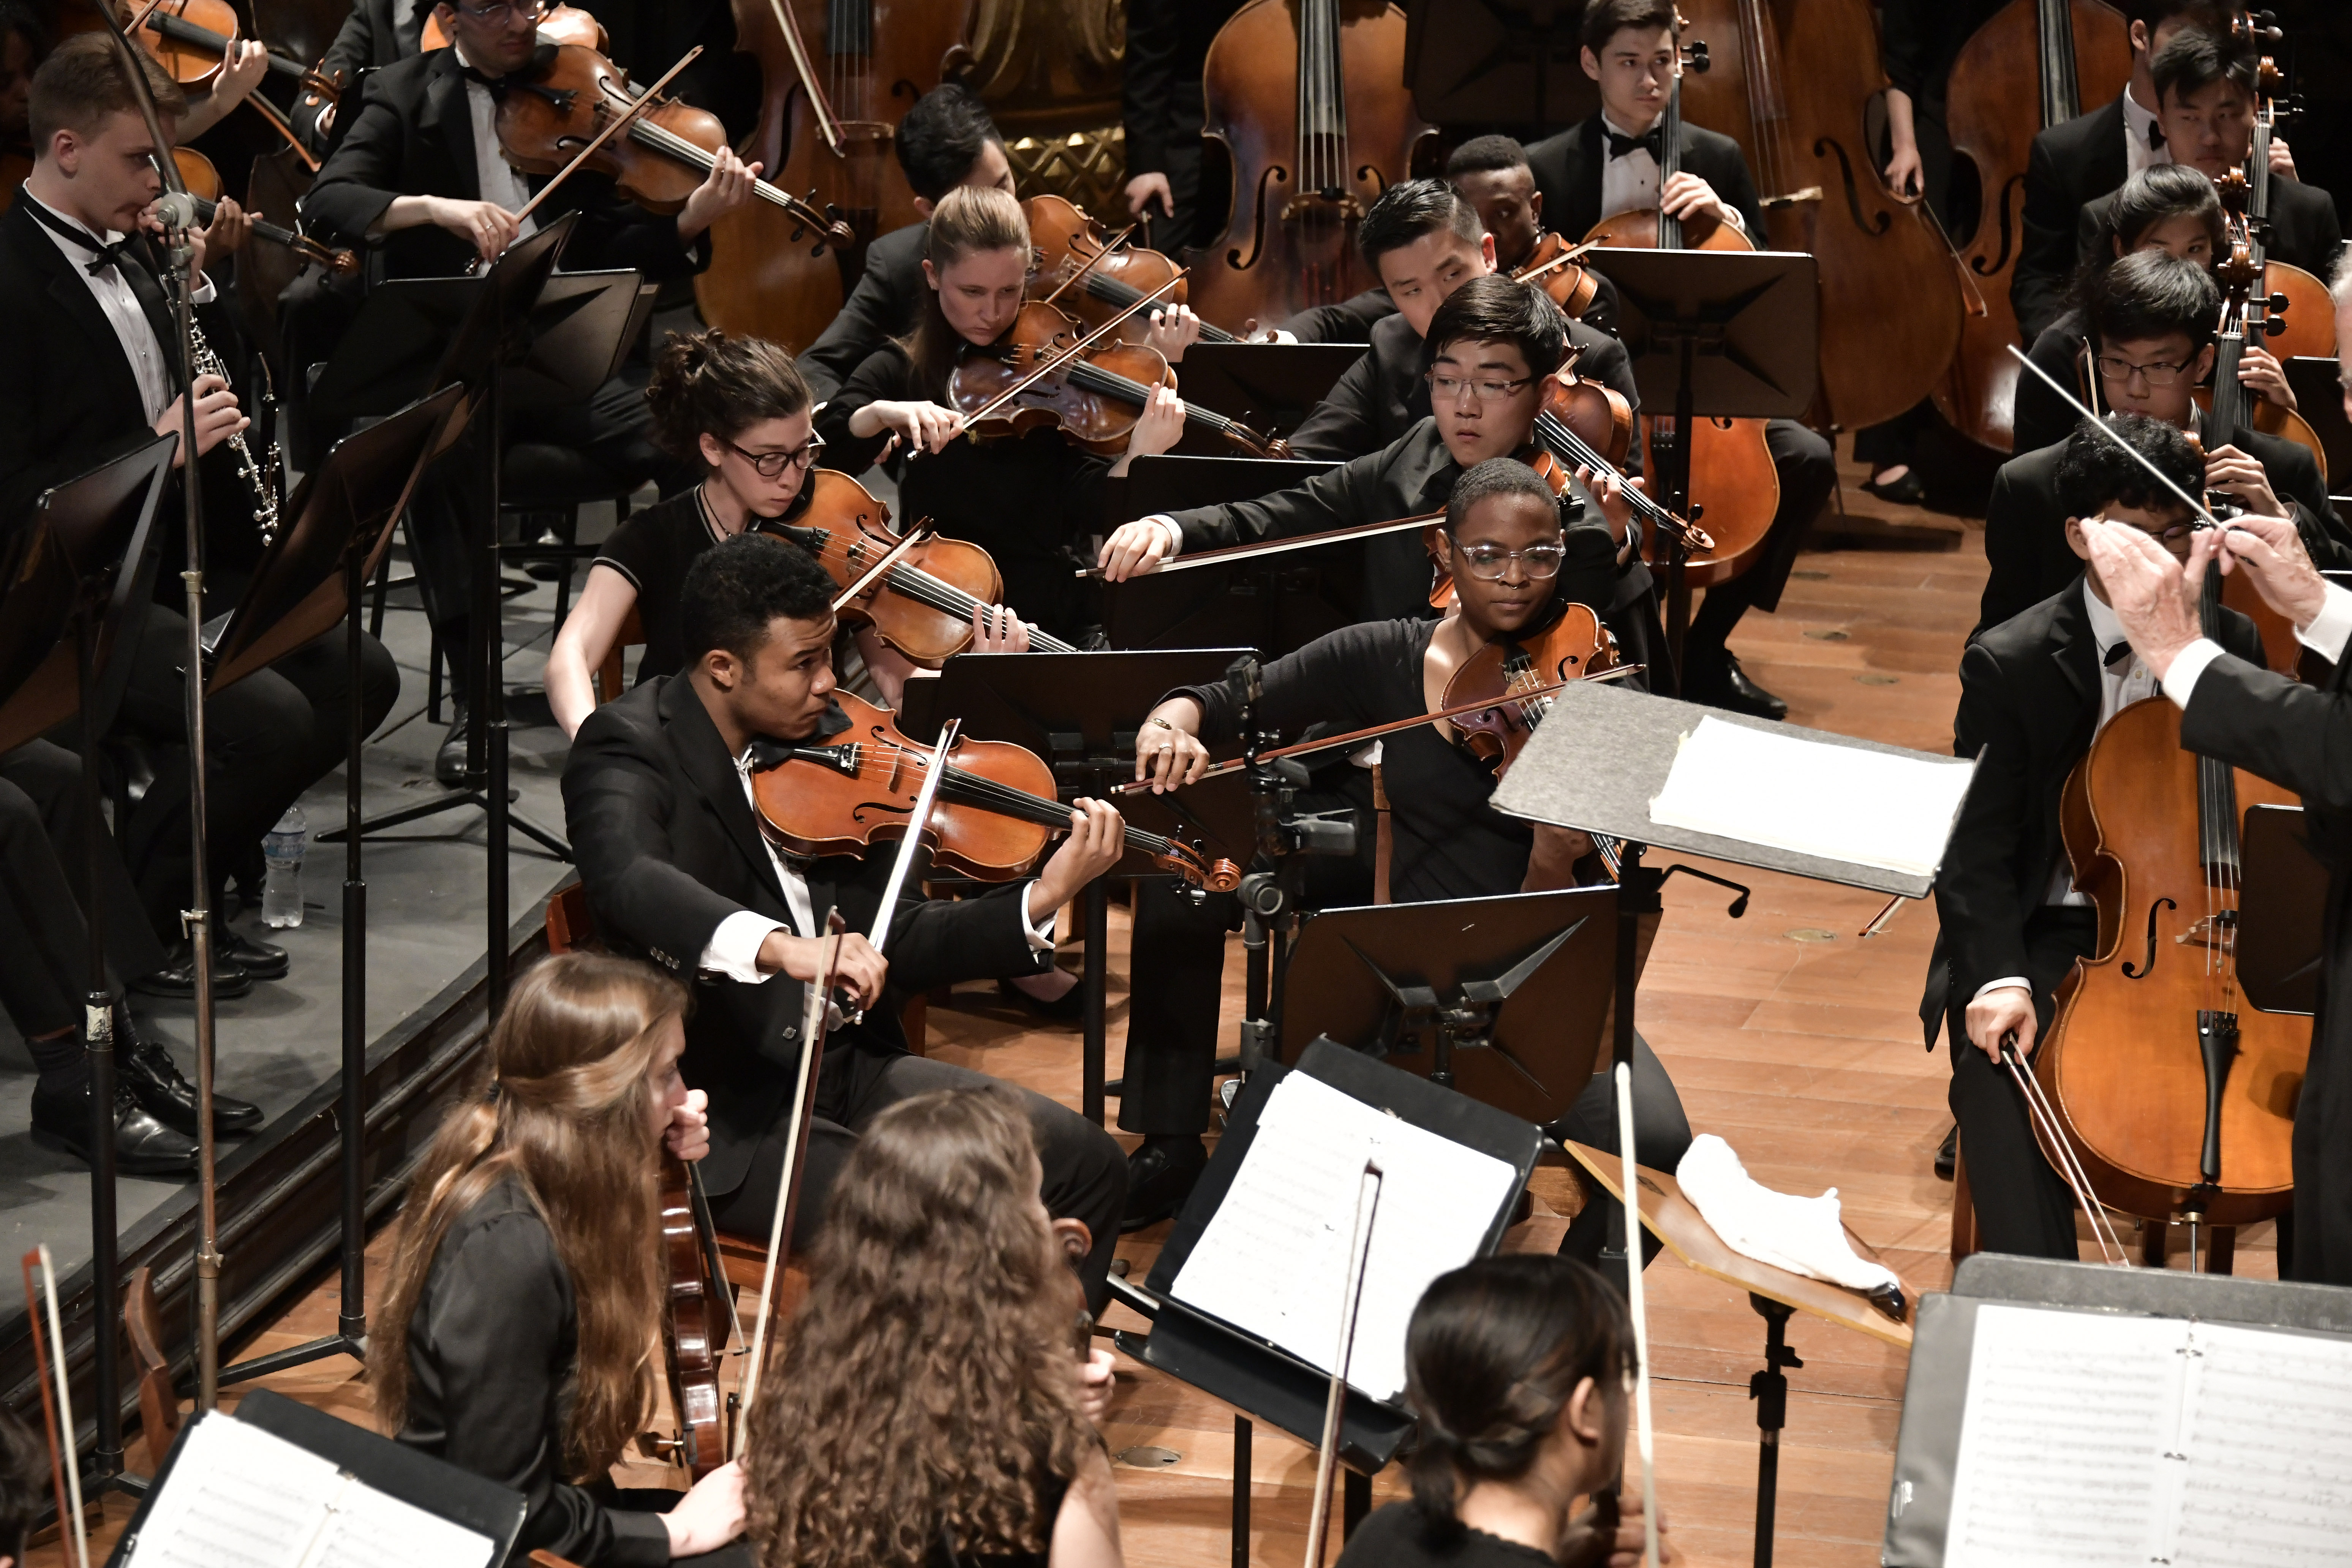 Violas-cellos-basses-inconcert